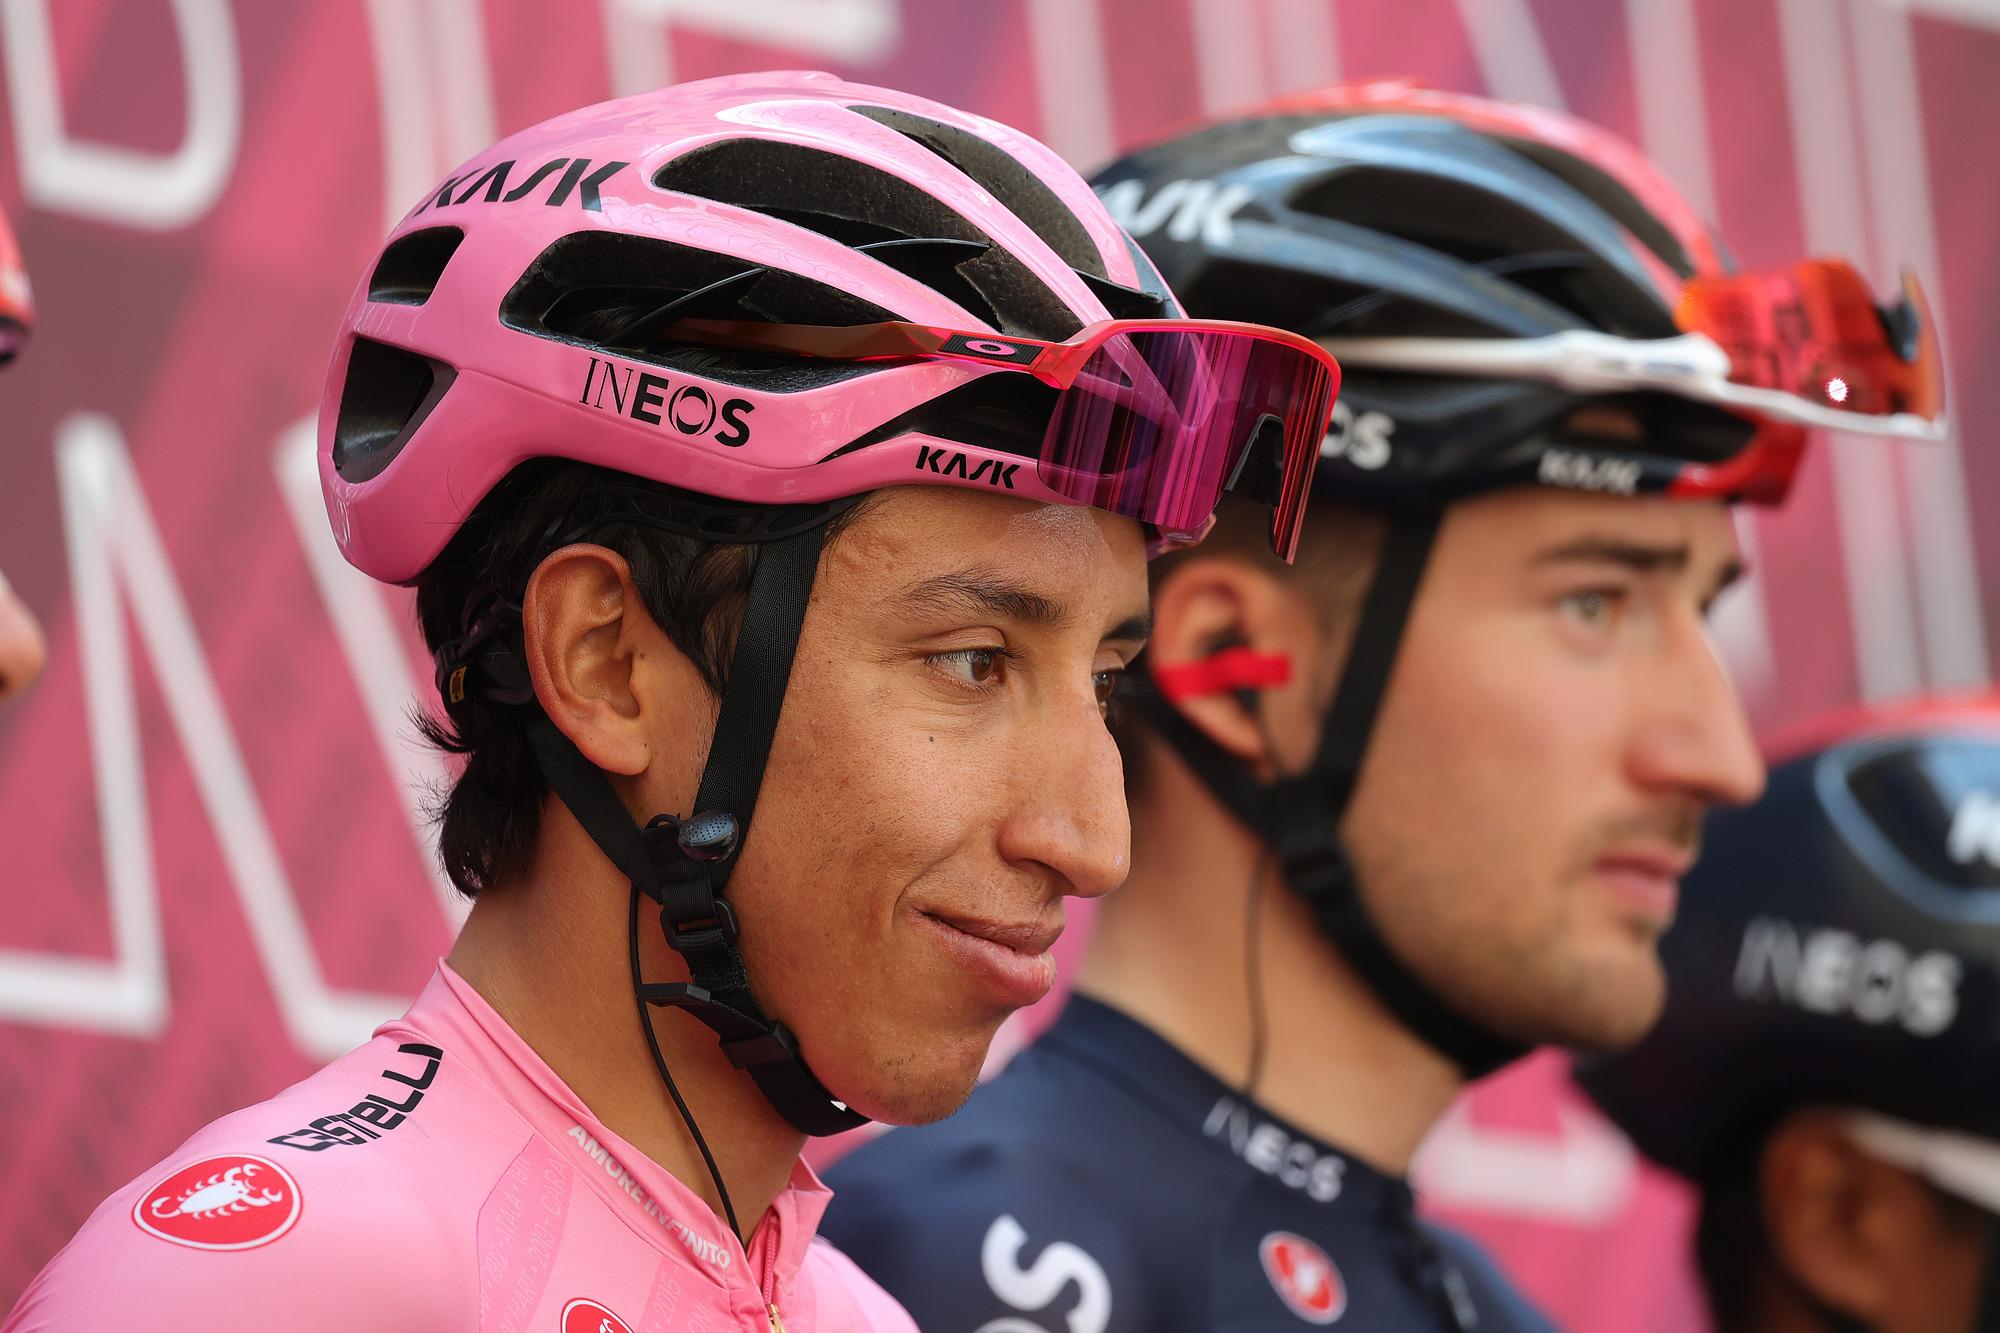 Giro dItalia 2021 104th Edition 18th stage Rovereto Stradella 231 km 27052021 Egan Bernal COL Ineos Grenadiers photo Ilario BiondiBettiniPhoto2021